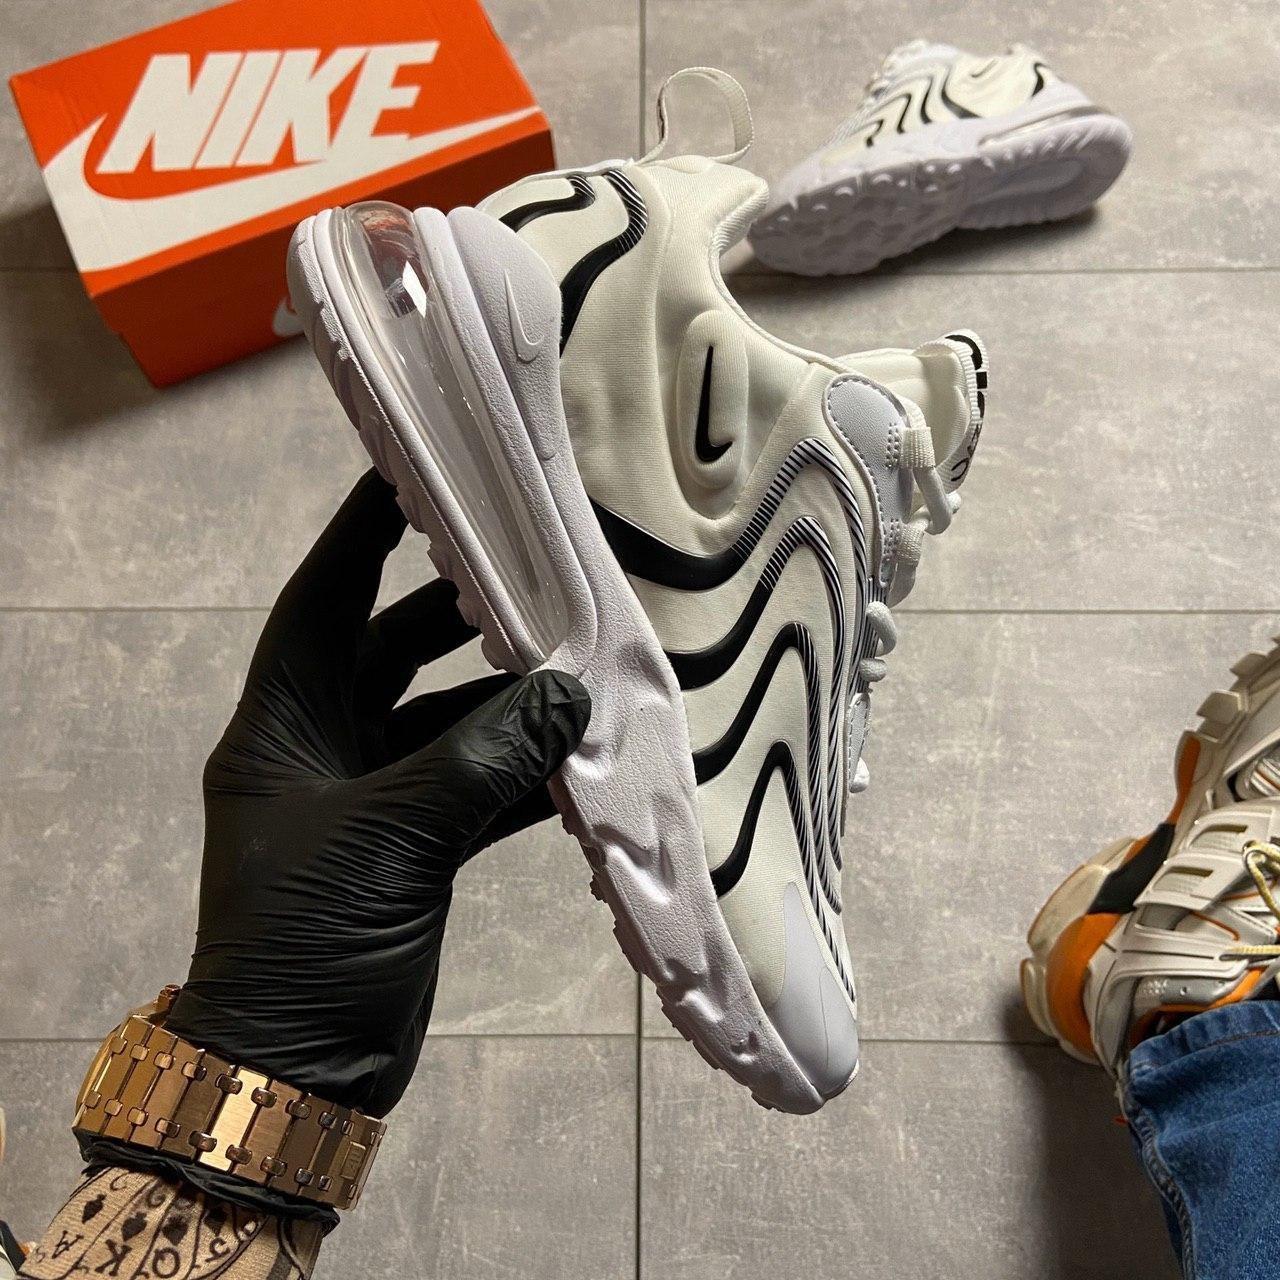 🔥 ВИДЕО ОБЗОР 🔥 Nike Air Max 270 React Eng White Black Найк Аир Макс 270 🔥 Найк мужские кроссовки 🔥